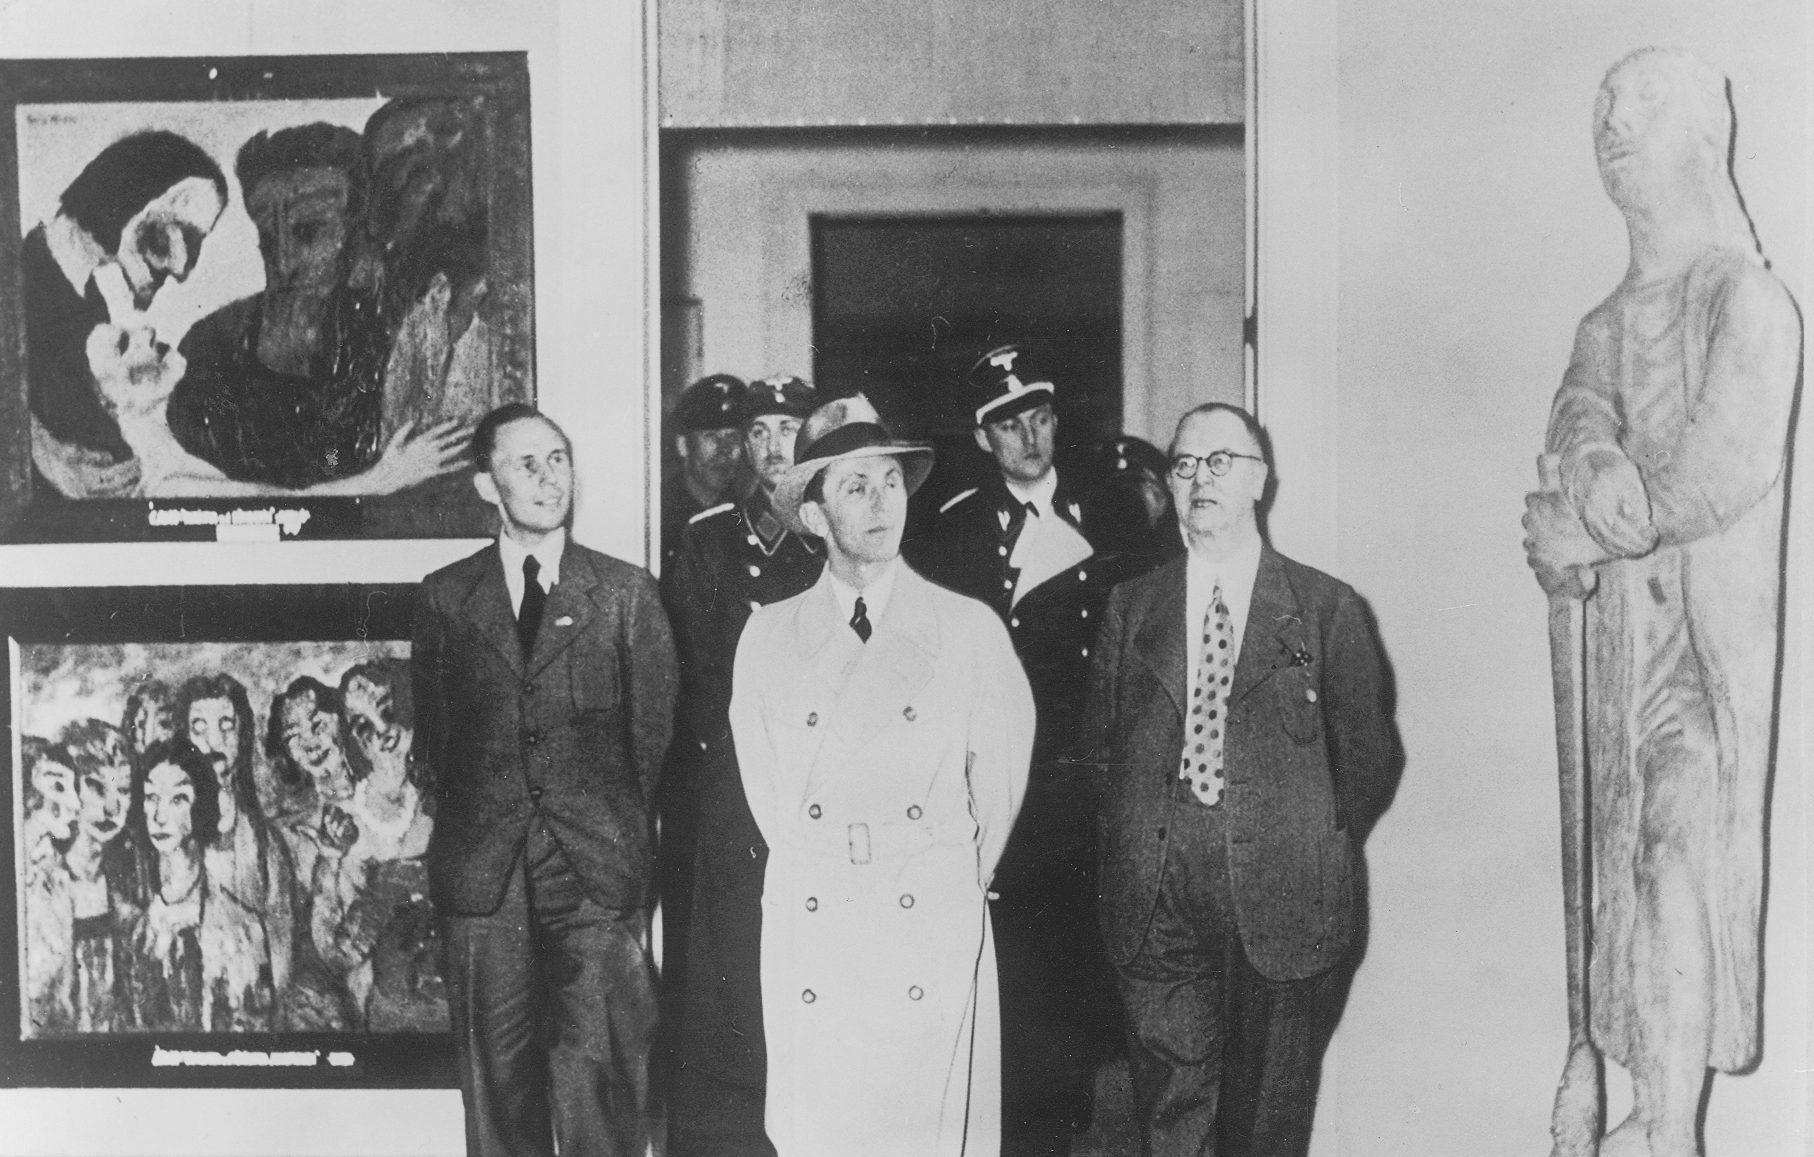 Joseph Goebbels, the German Nazi politician, views the Degenerate Art Exhibition, which included Gerhard Marcks' work.